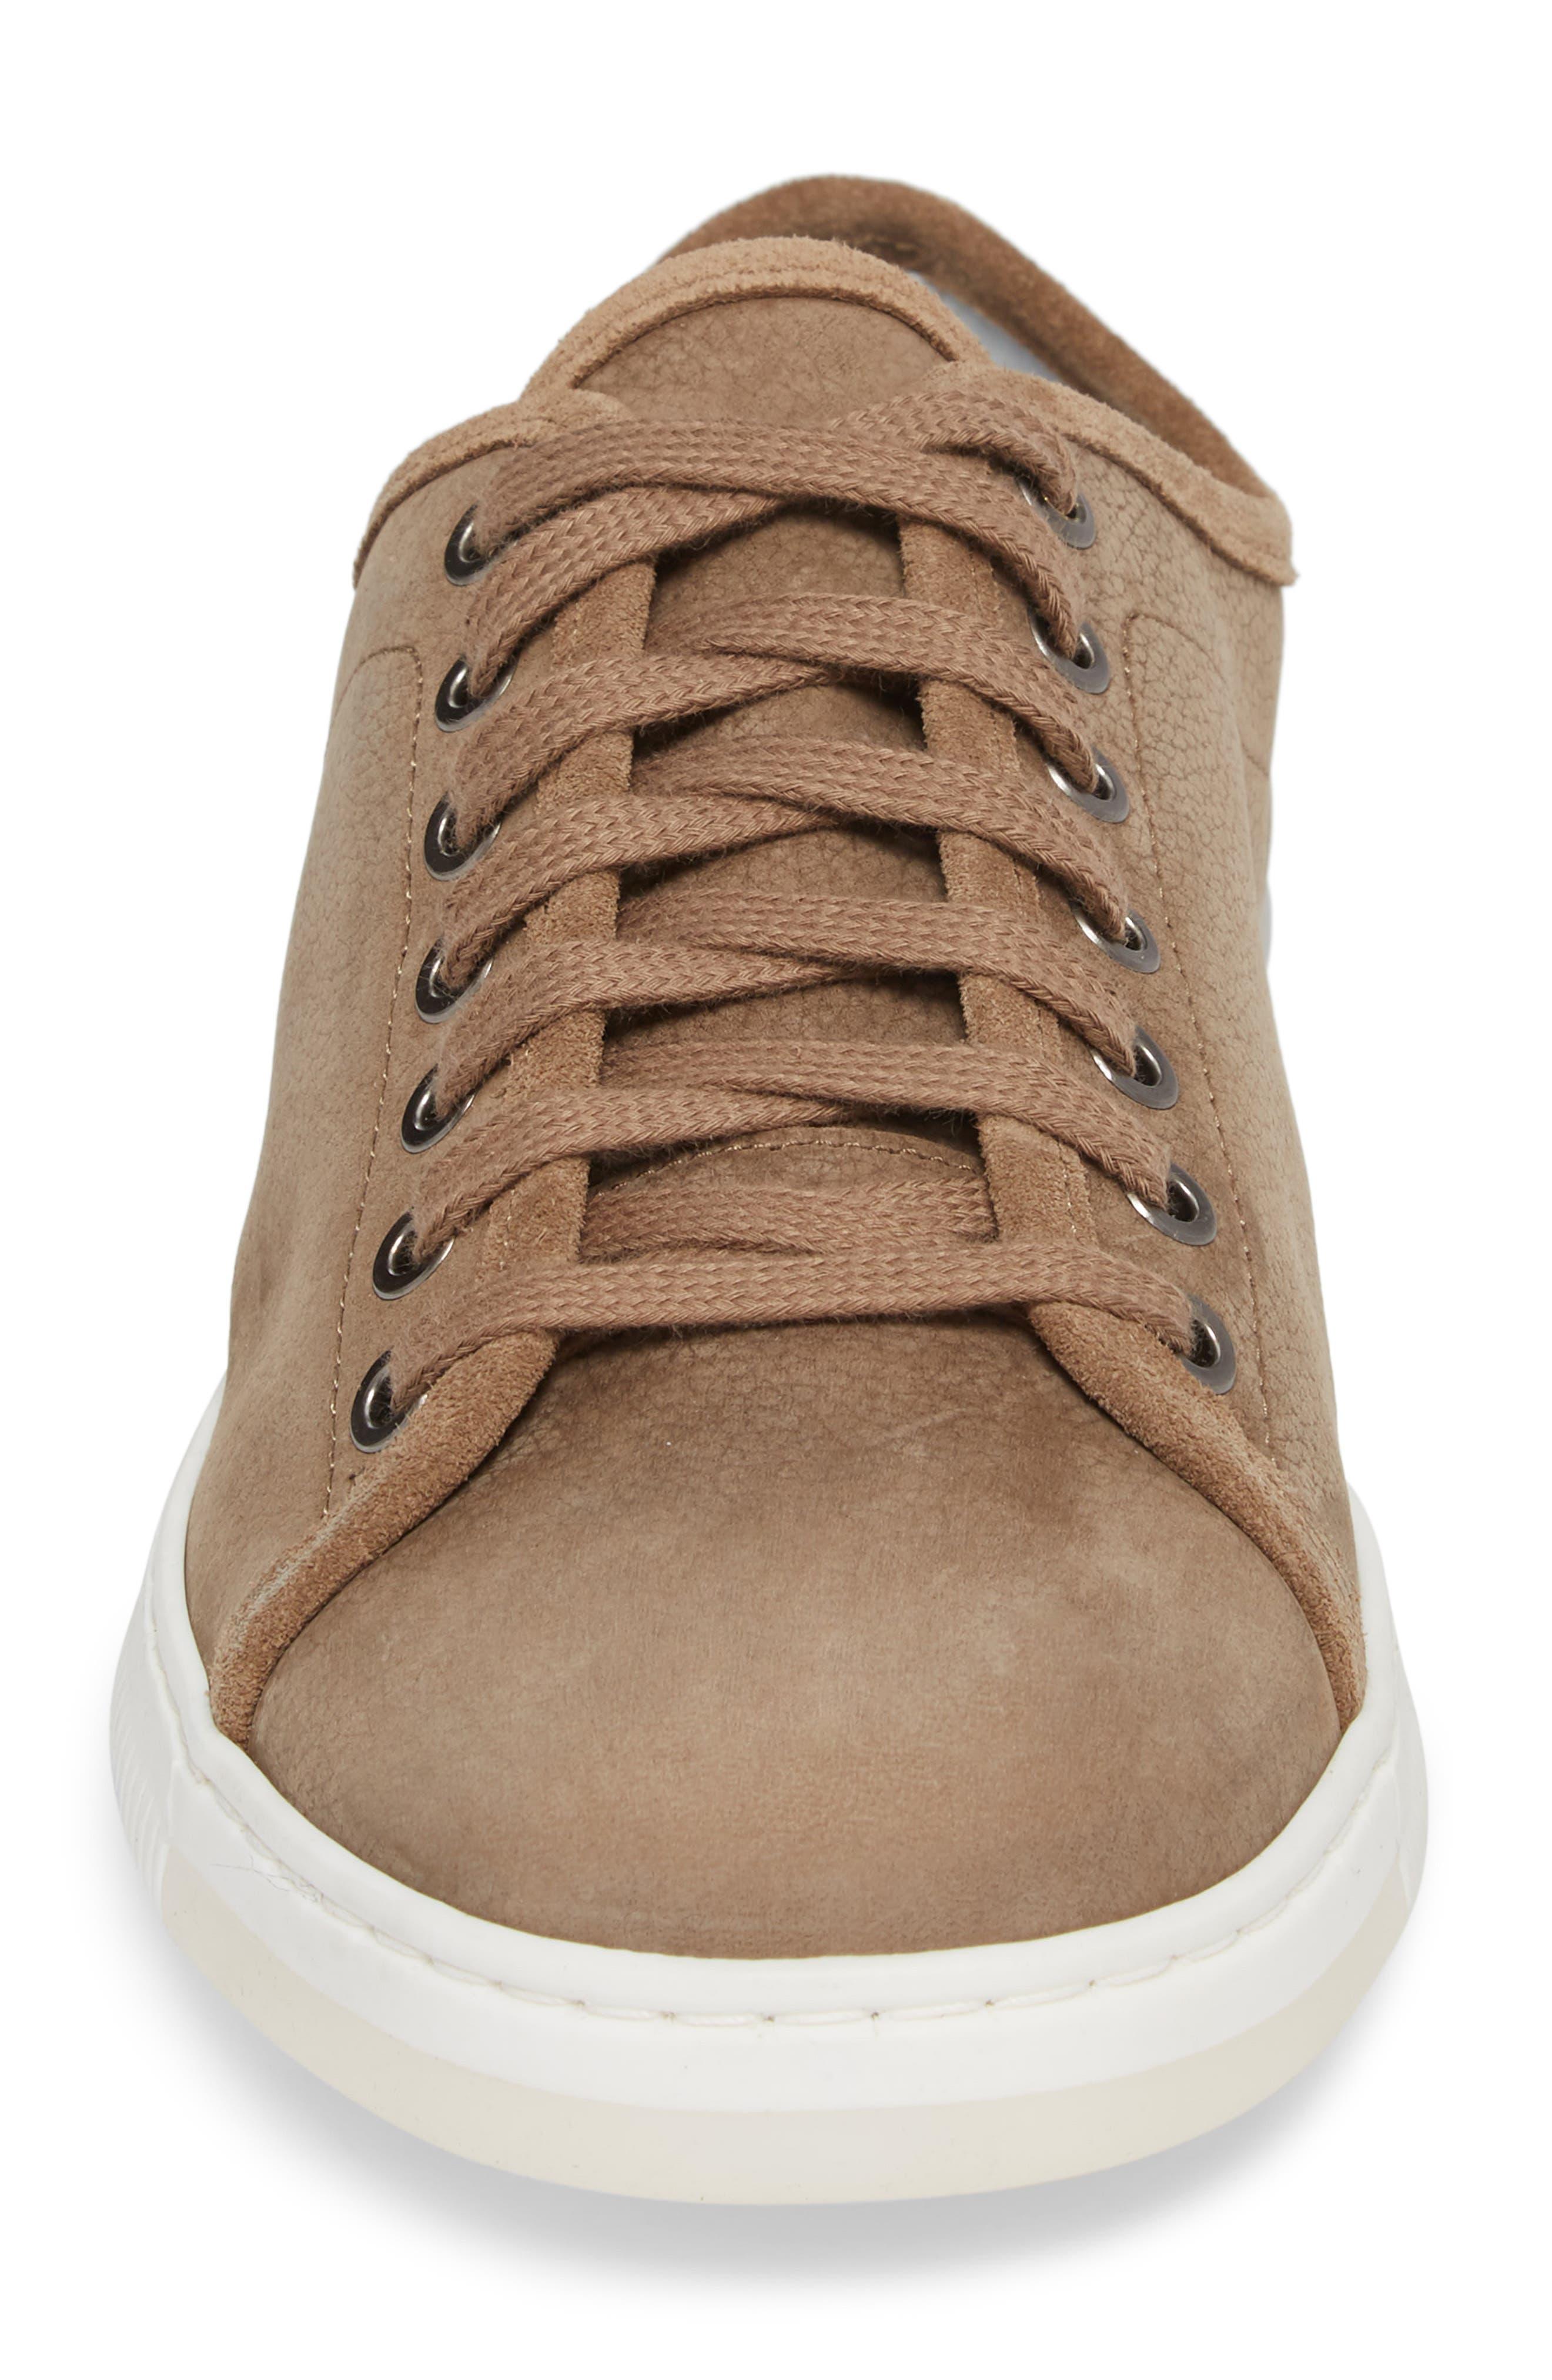 'Justen' Sneaker,                             Alternate thumbnail 4, color,                             251